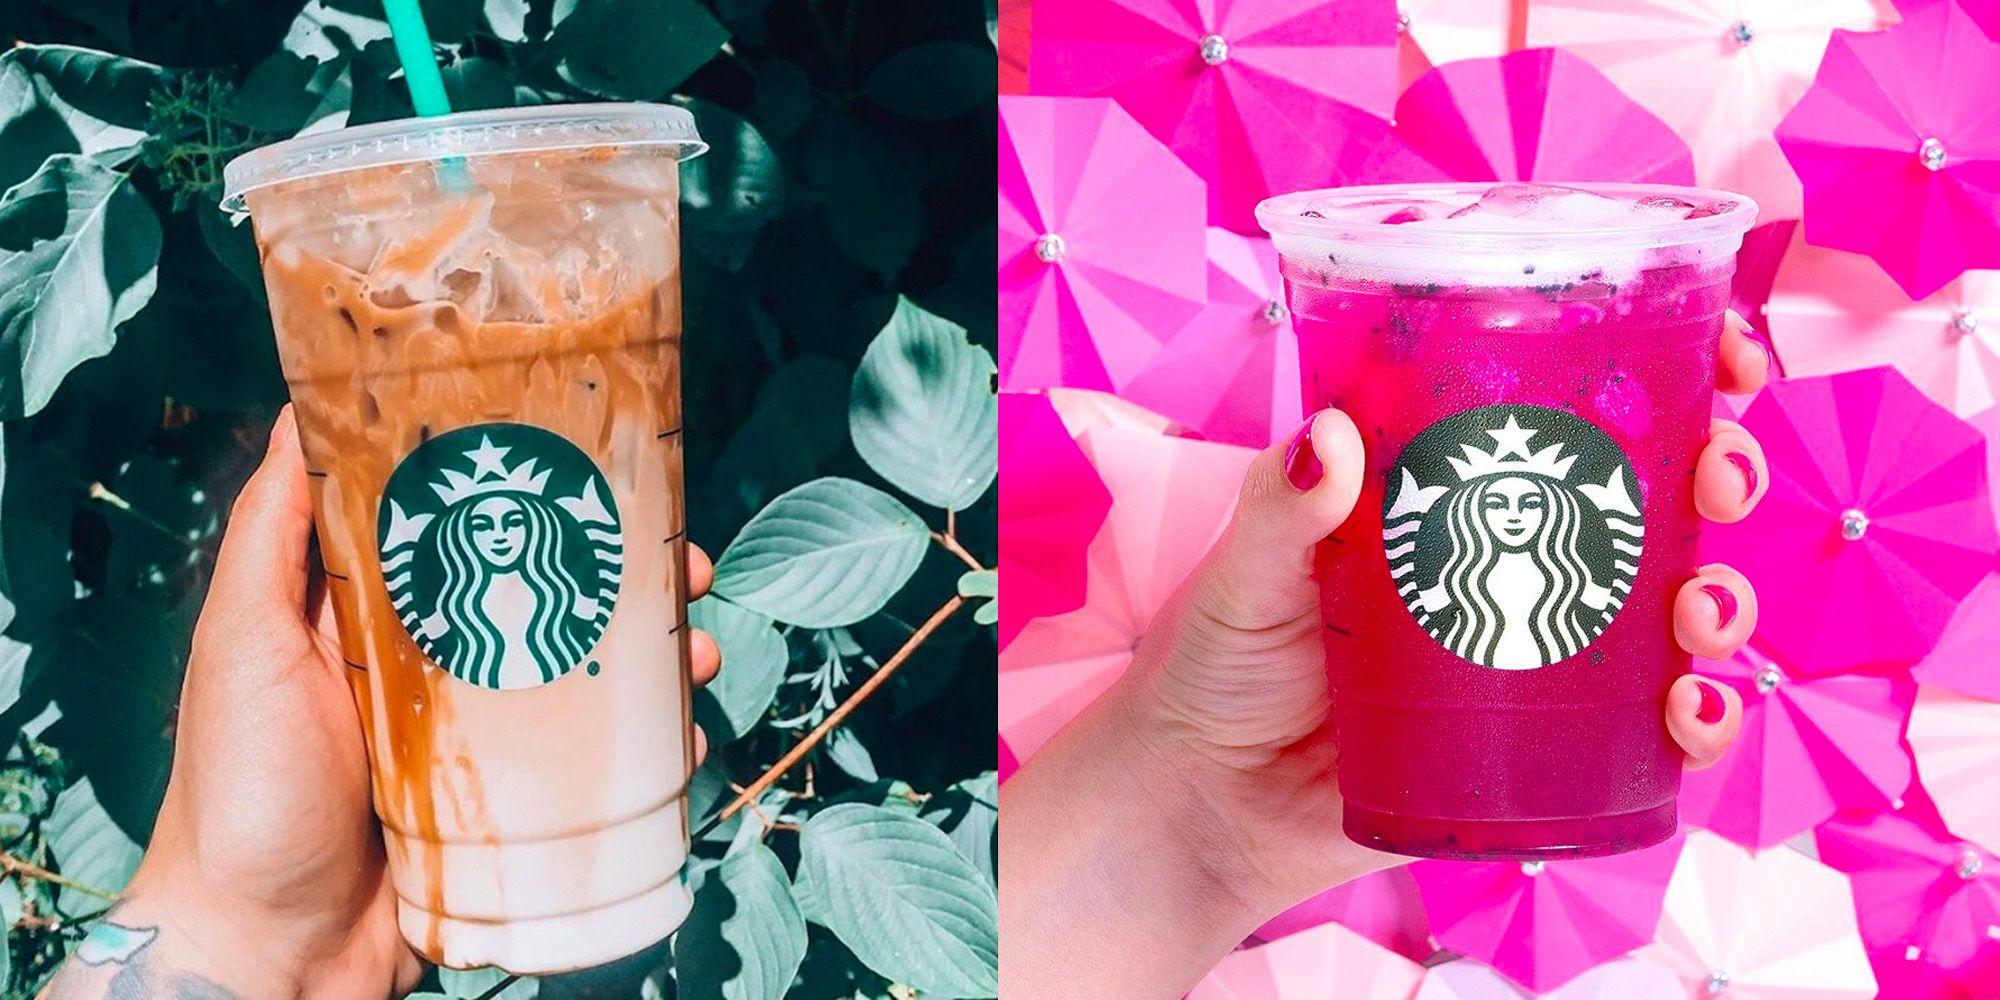 39 of the Unhealthiest Starbucks Drinks